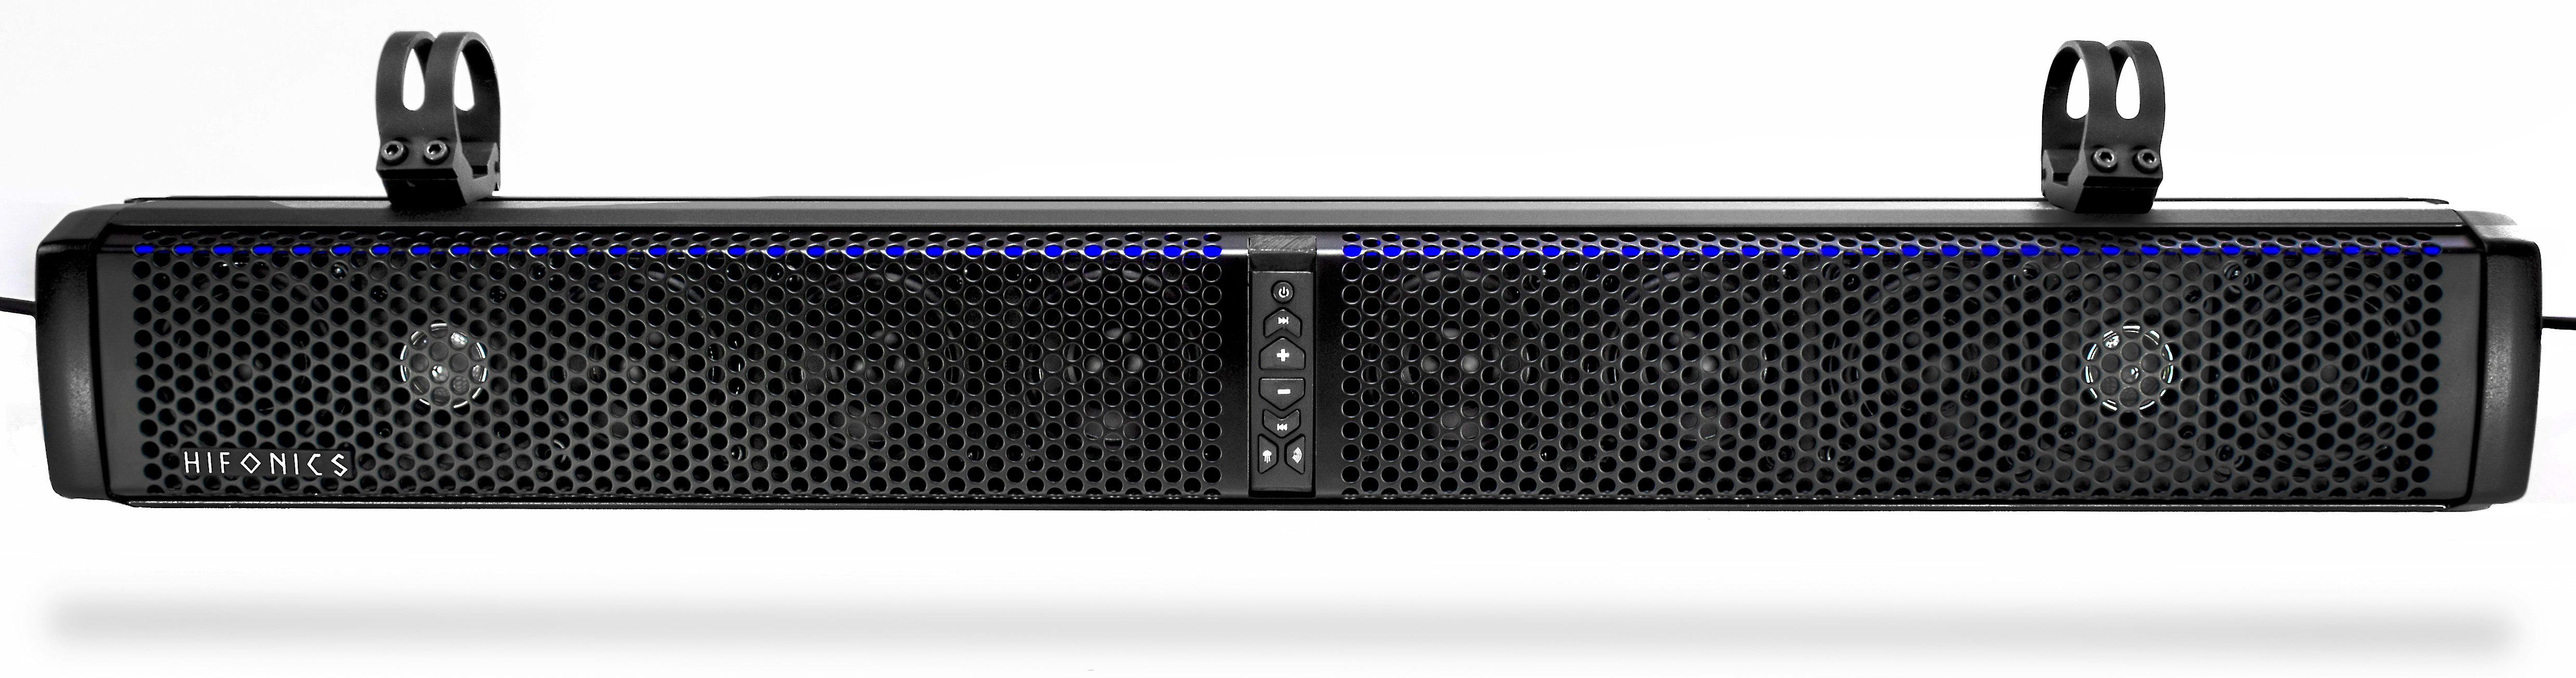 hifonics thor tps-10 powered 10-speaker bluetooth® soundbar at crutchfield